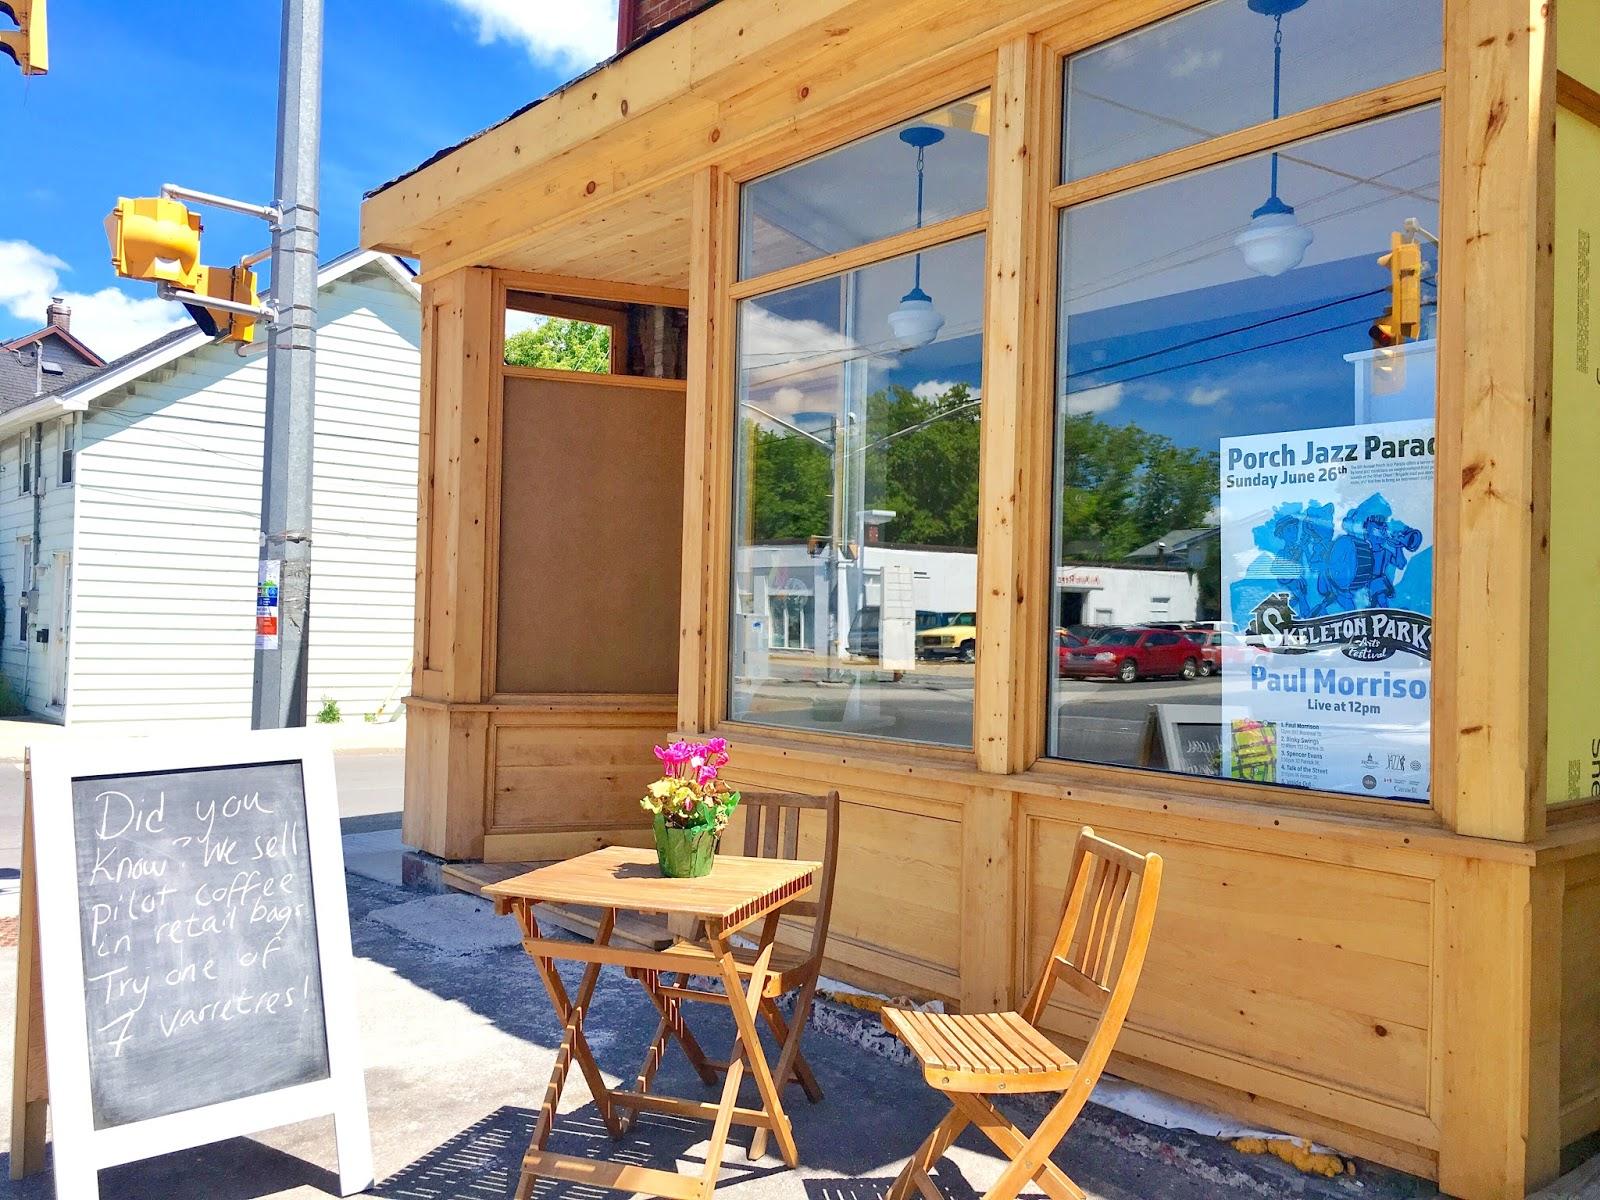 The Elm Cafe